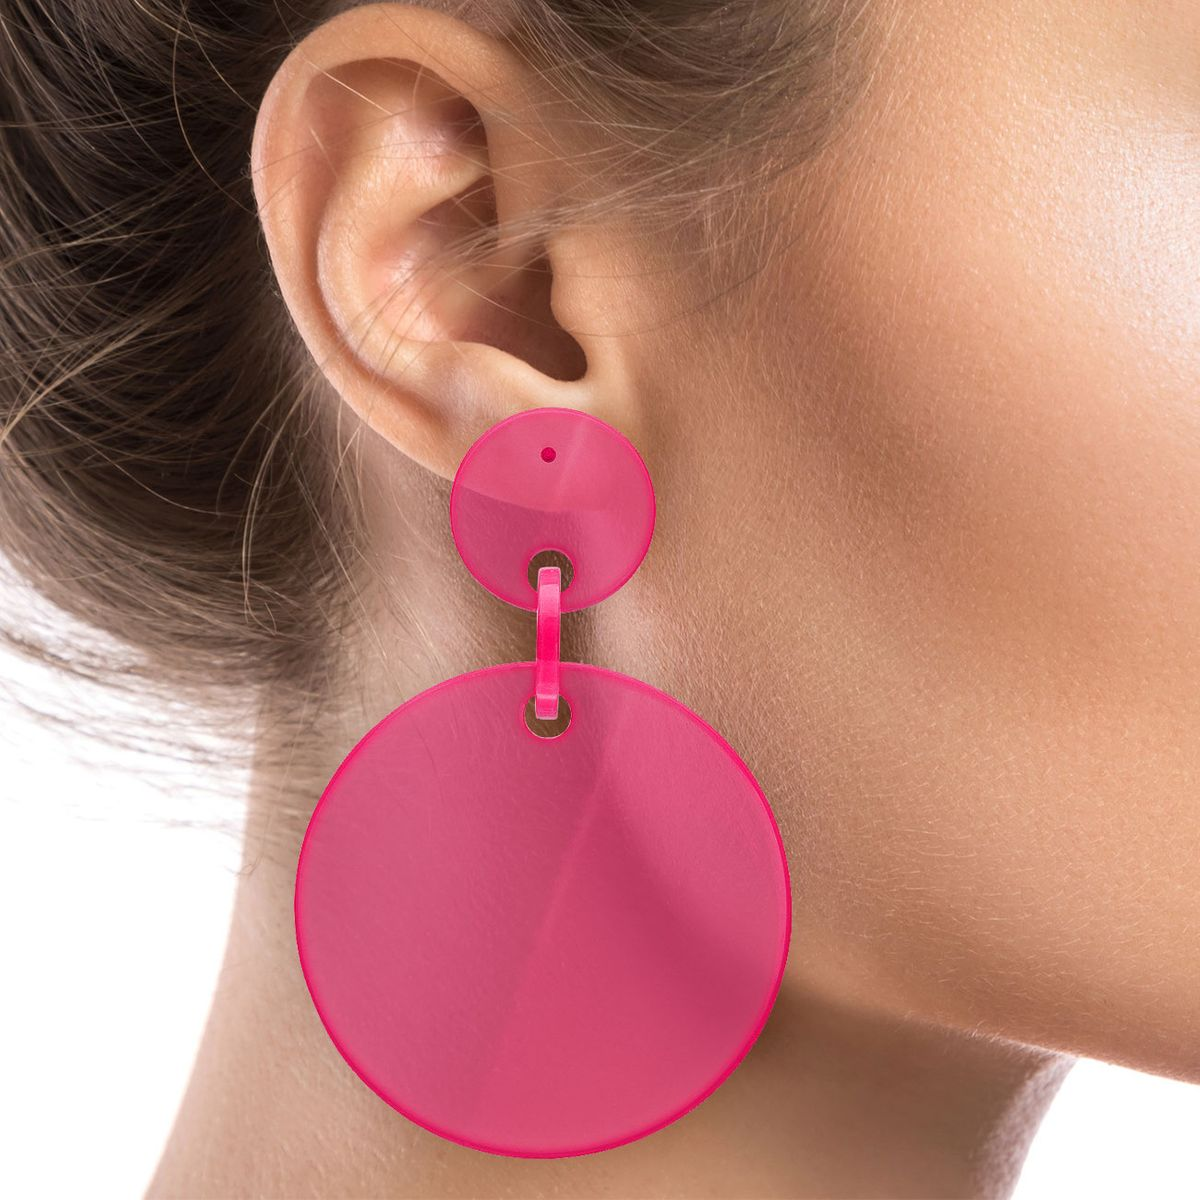 1 Paar Statement Ohrhänger Ohrringe Ohrstecker Creolen Loops Retro 80er Style